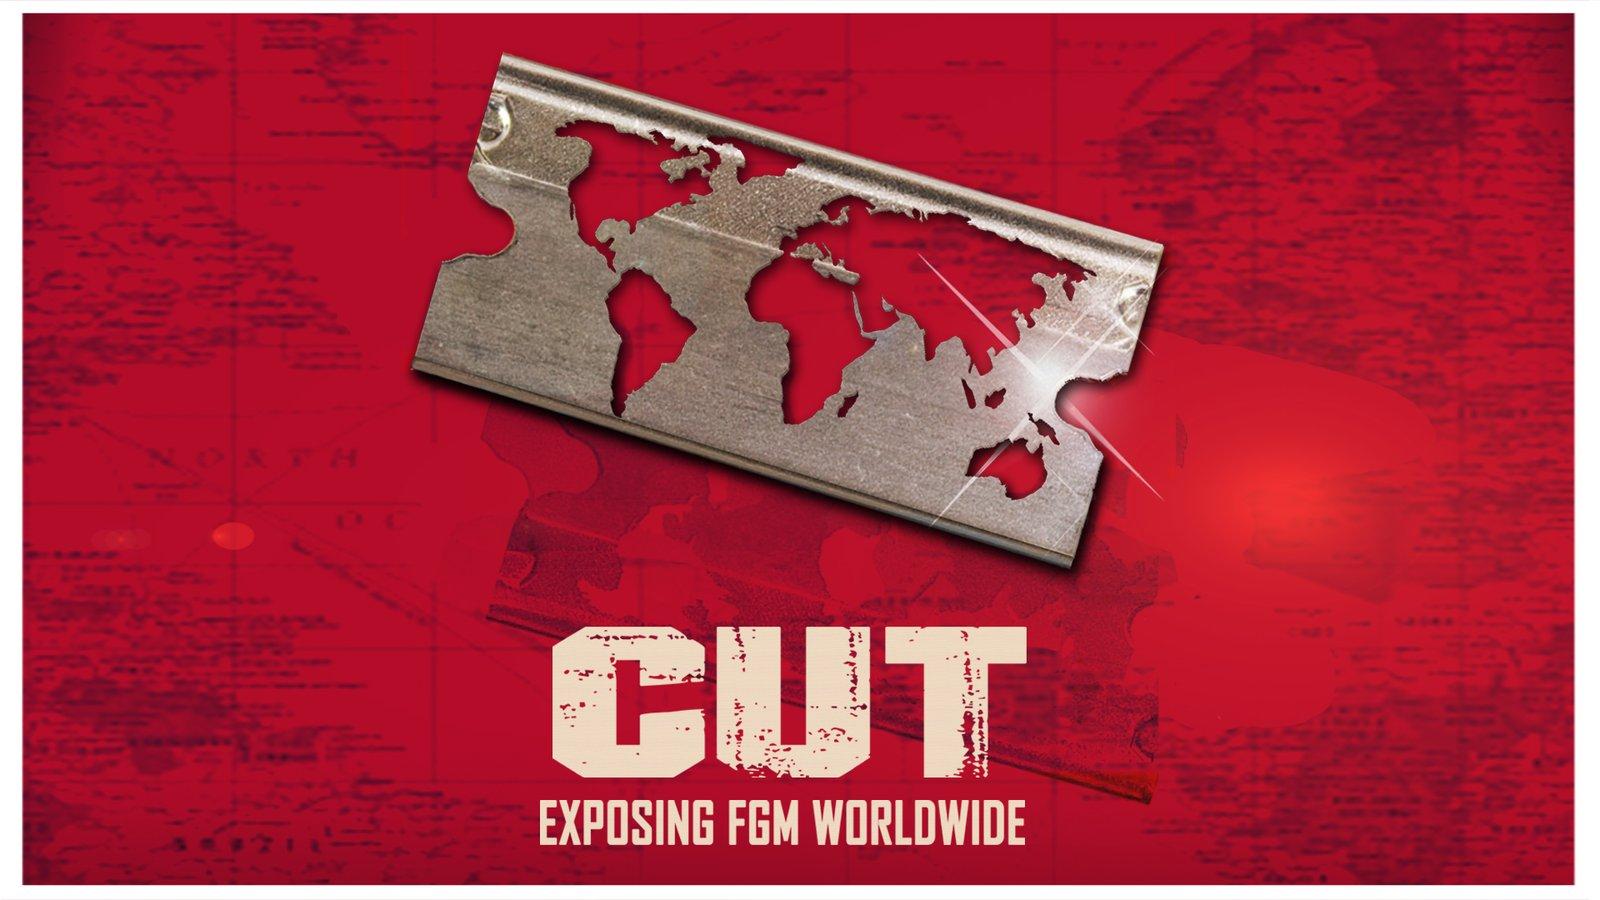 Cut - Exposing FGM Worldwide